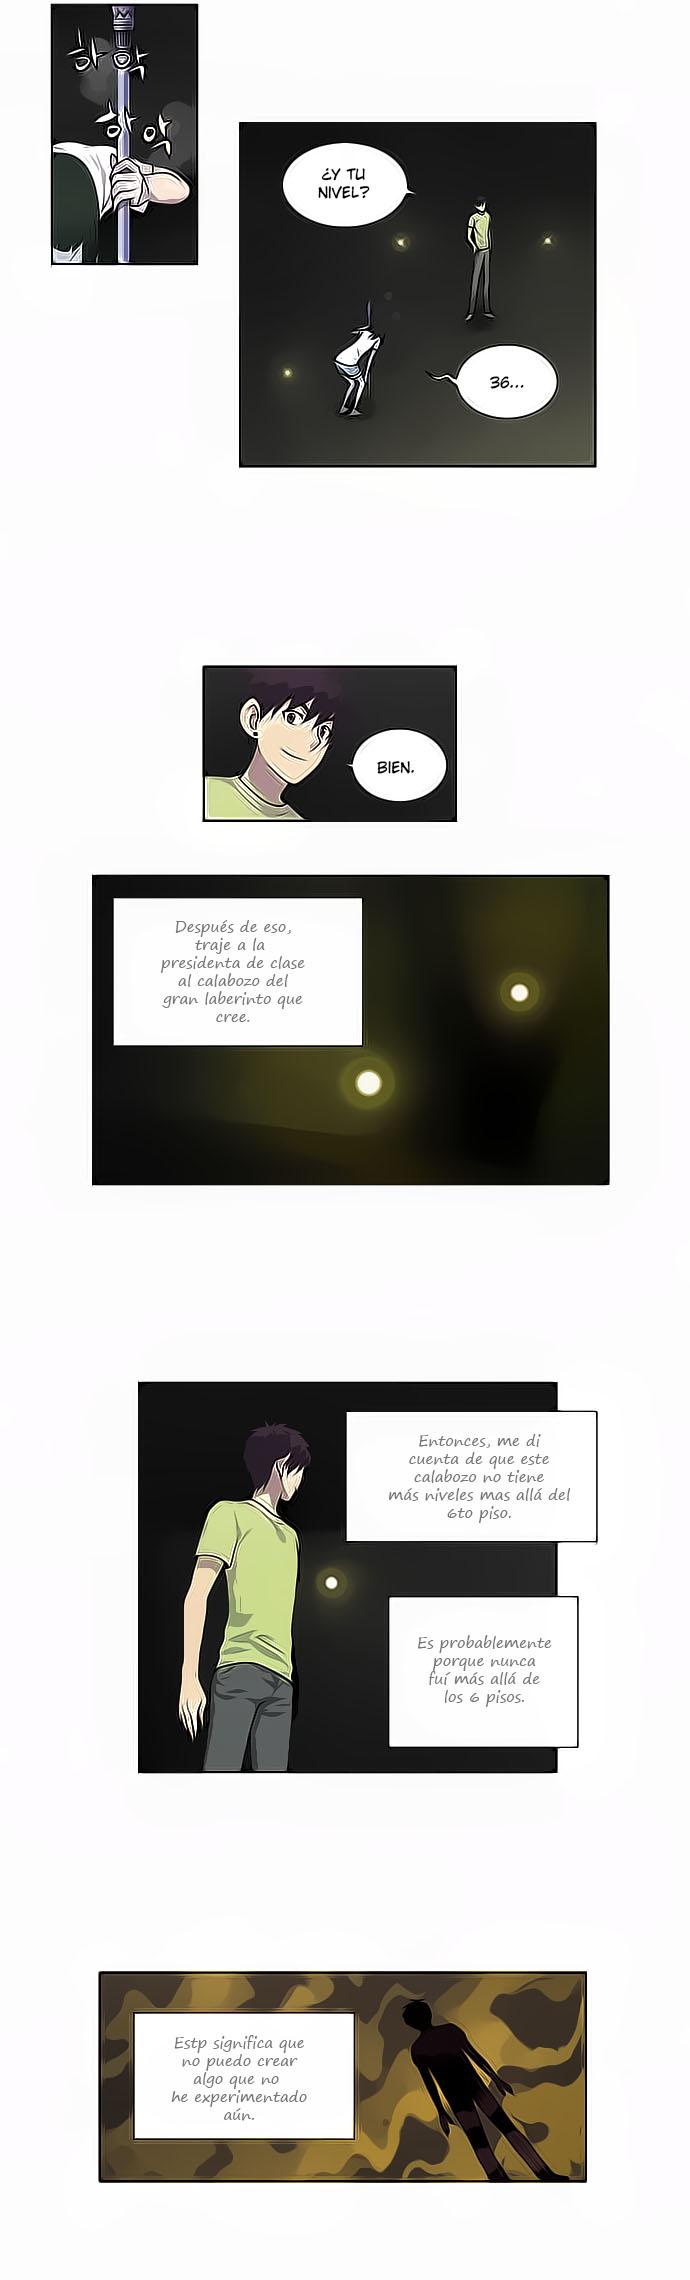 http://c5.ninemanga.com/es_manga/61/1725/434275/b283062ab4e7332f4252bf805d7b8a52.jpg Page 14